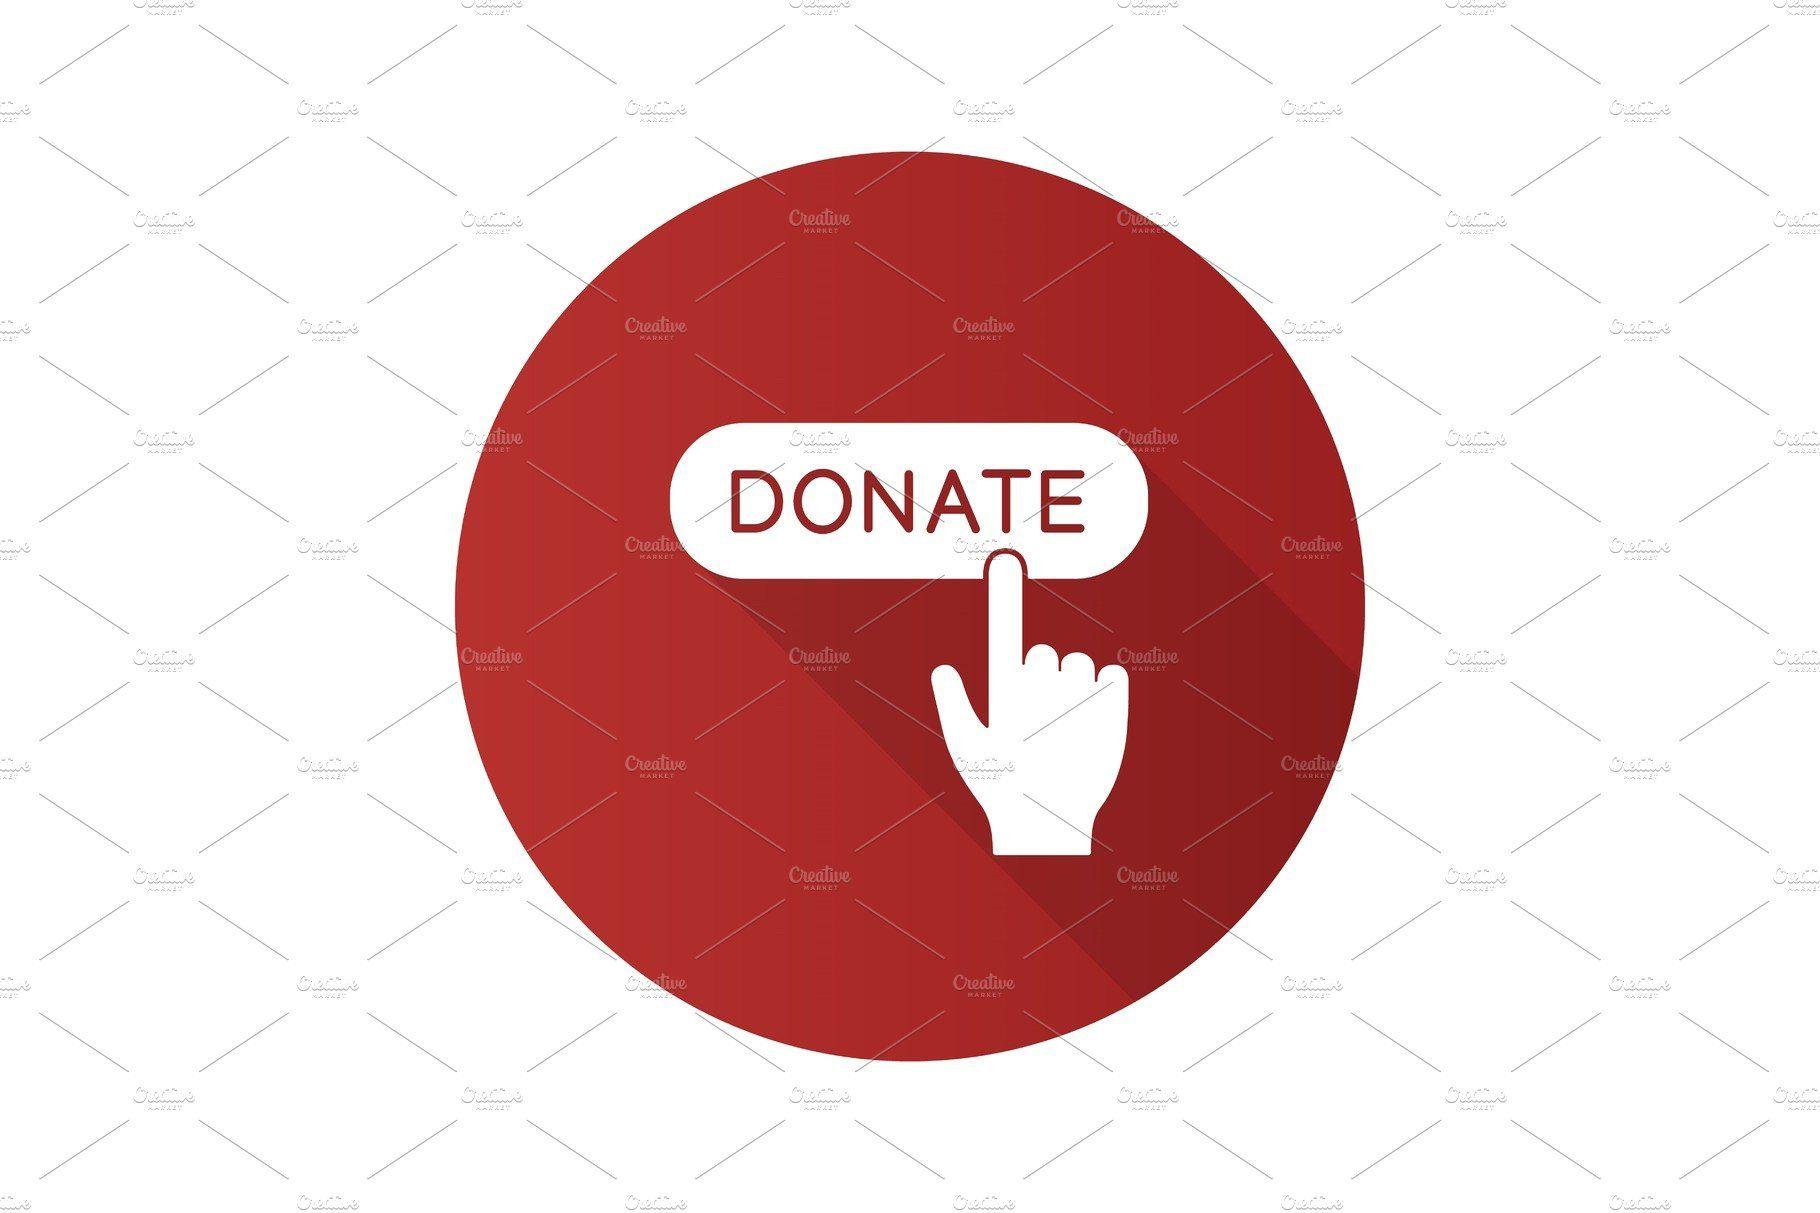 Donate button click icon , ad, designlongshadowflat